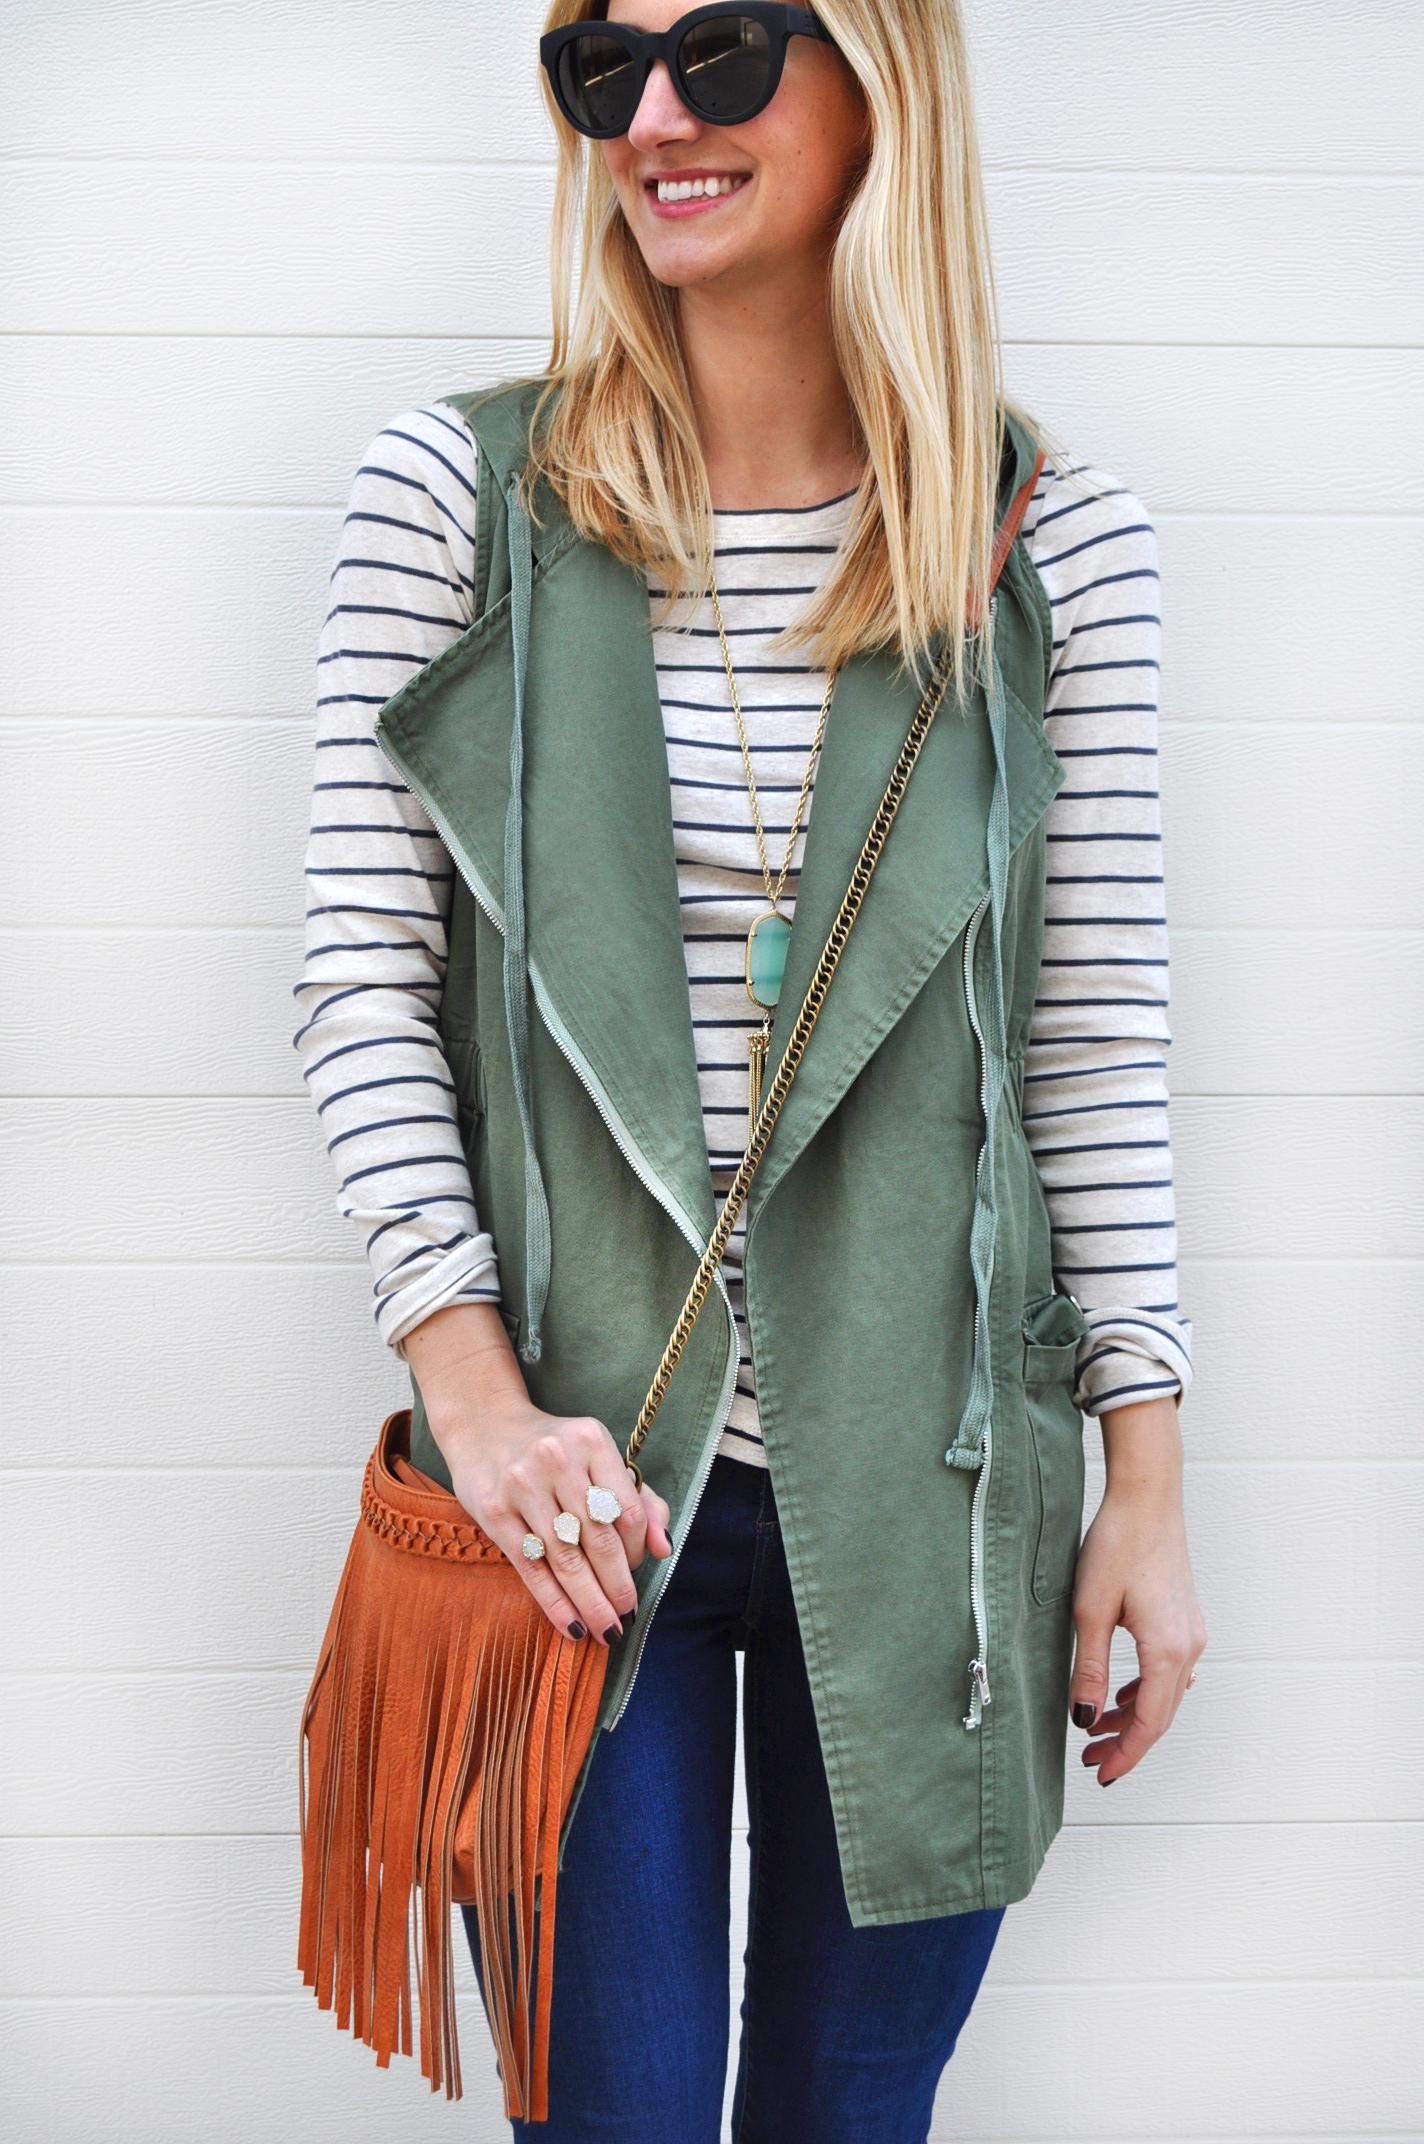 livvyland-blog-olivia-watson-army-green-utility-vest-fringe-handbag-brown-chelsea-boots-booties-austin-texas-fashion-blogger-3